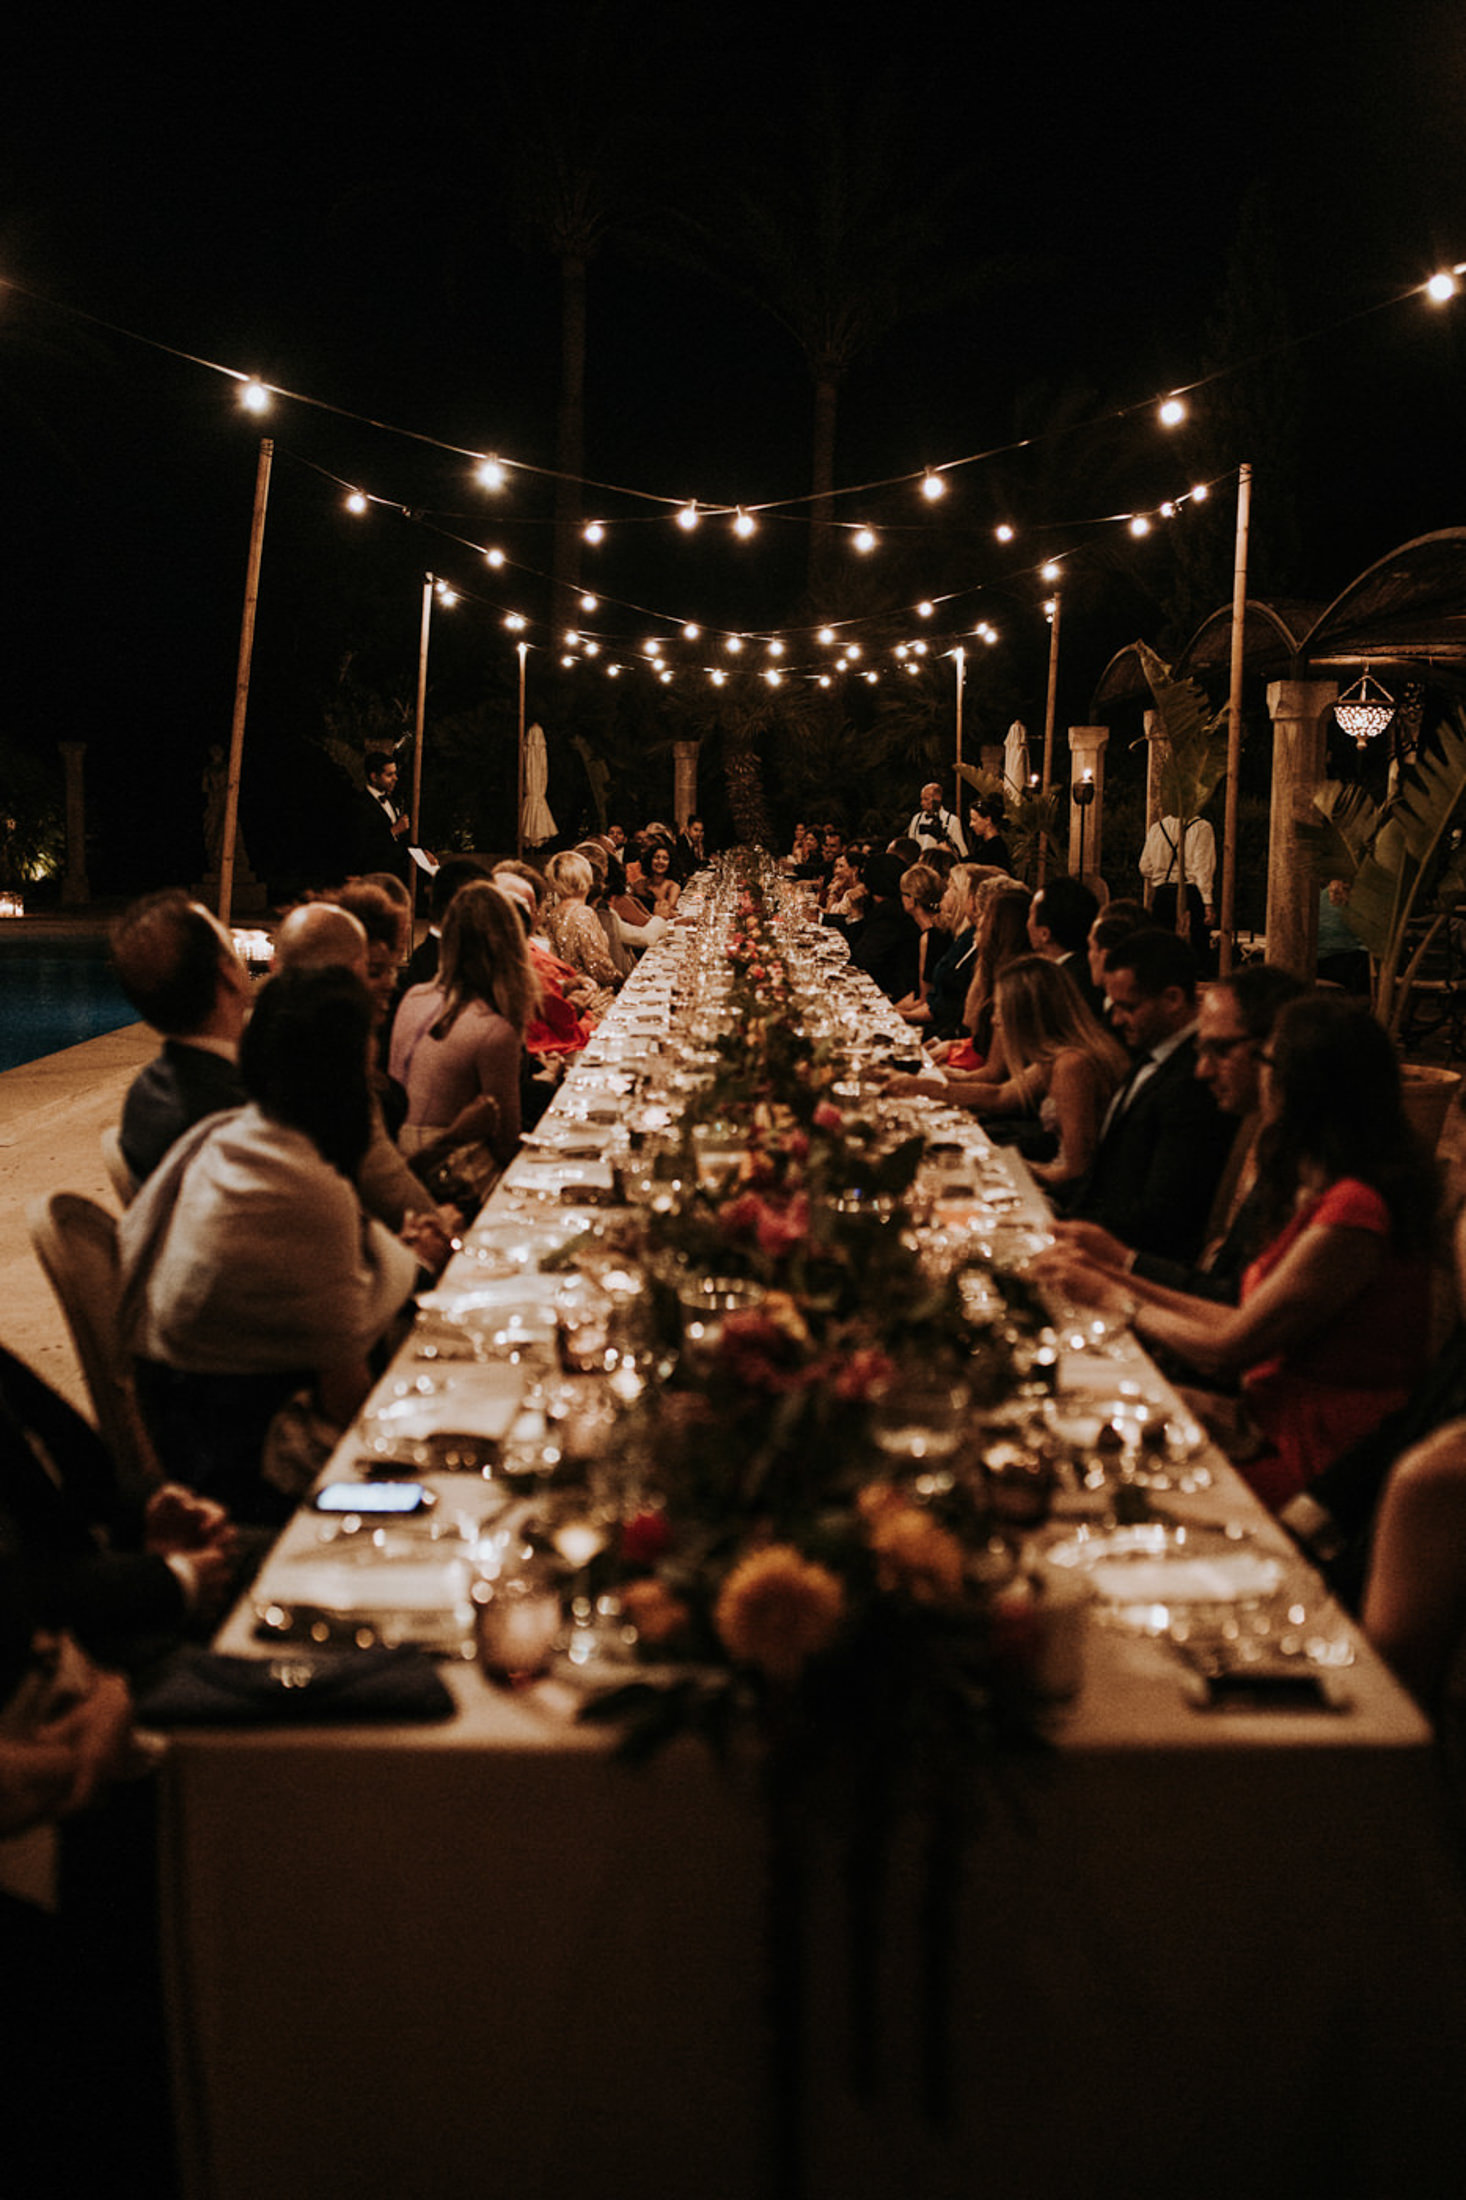 Wedding_Photographer_Mallorca_Daniela-Marquardt_Photography_New_York_Iceland_Tuscany_Santorini_Portugal_Austria_Bavaria_Elopement_Hochzeitsfotograf_AntjeRajat2_112